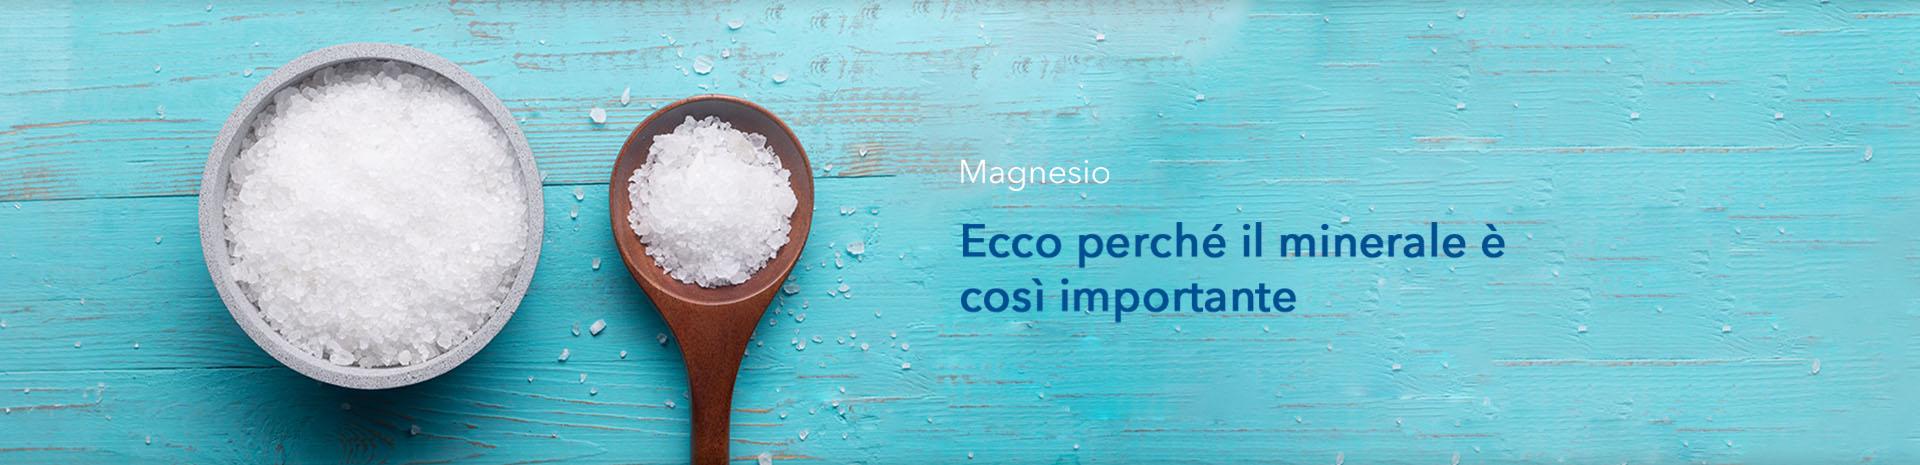 Magnesio - GUIDA - SHOP FARMACIA